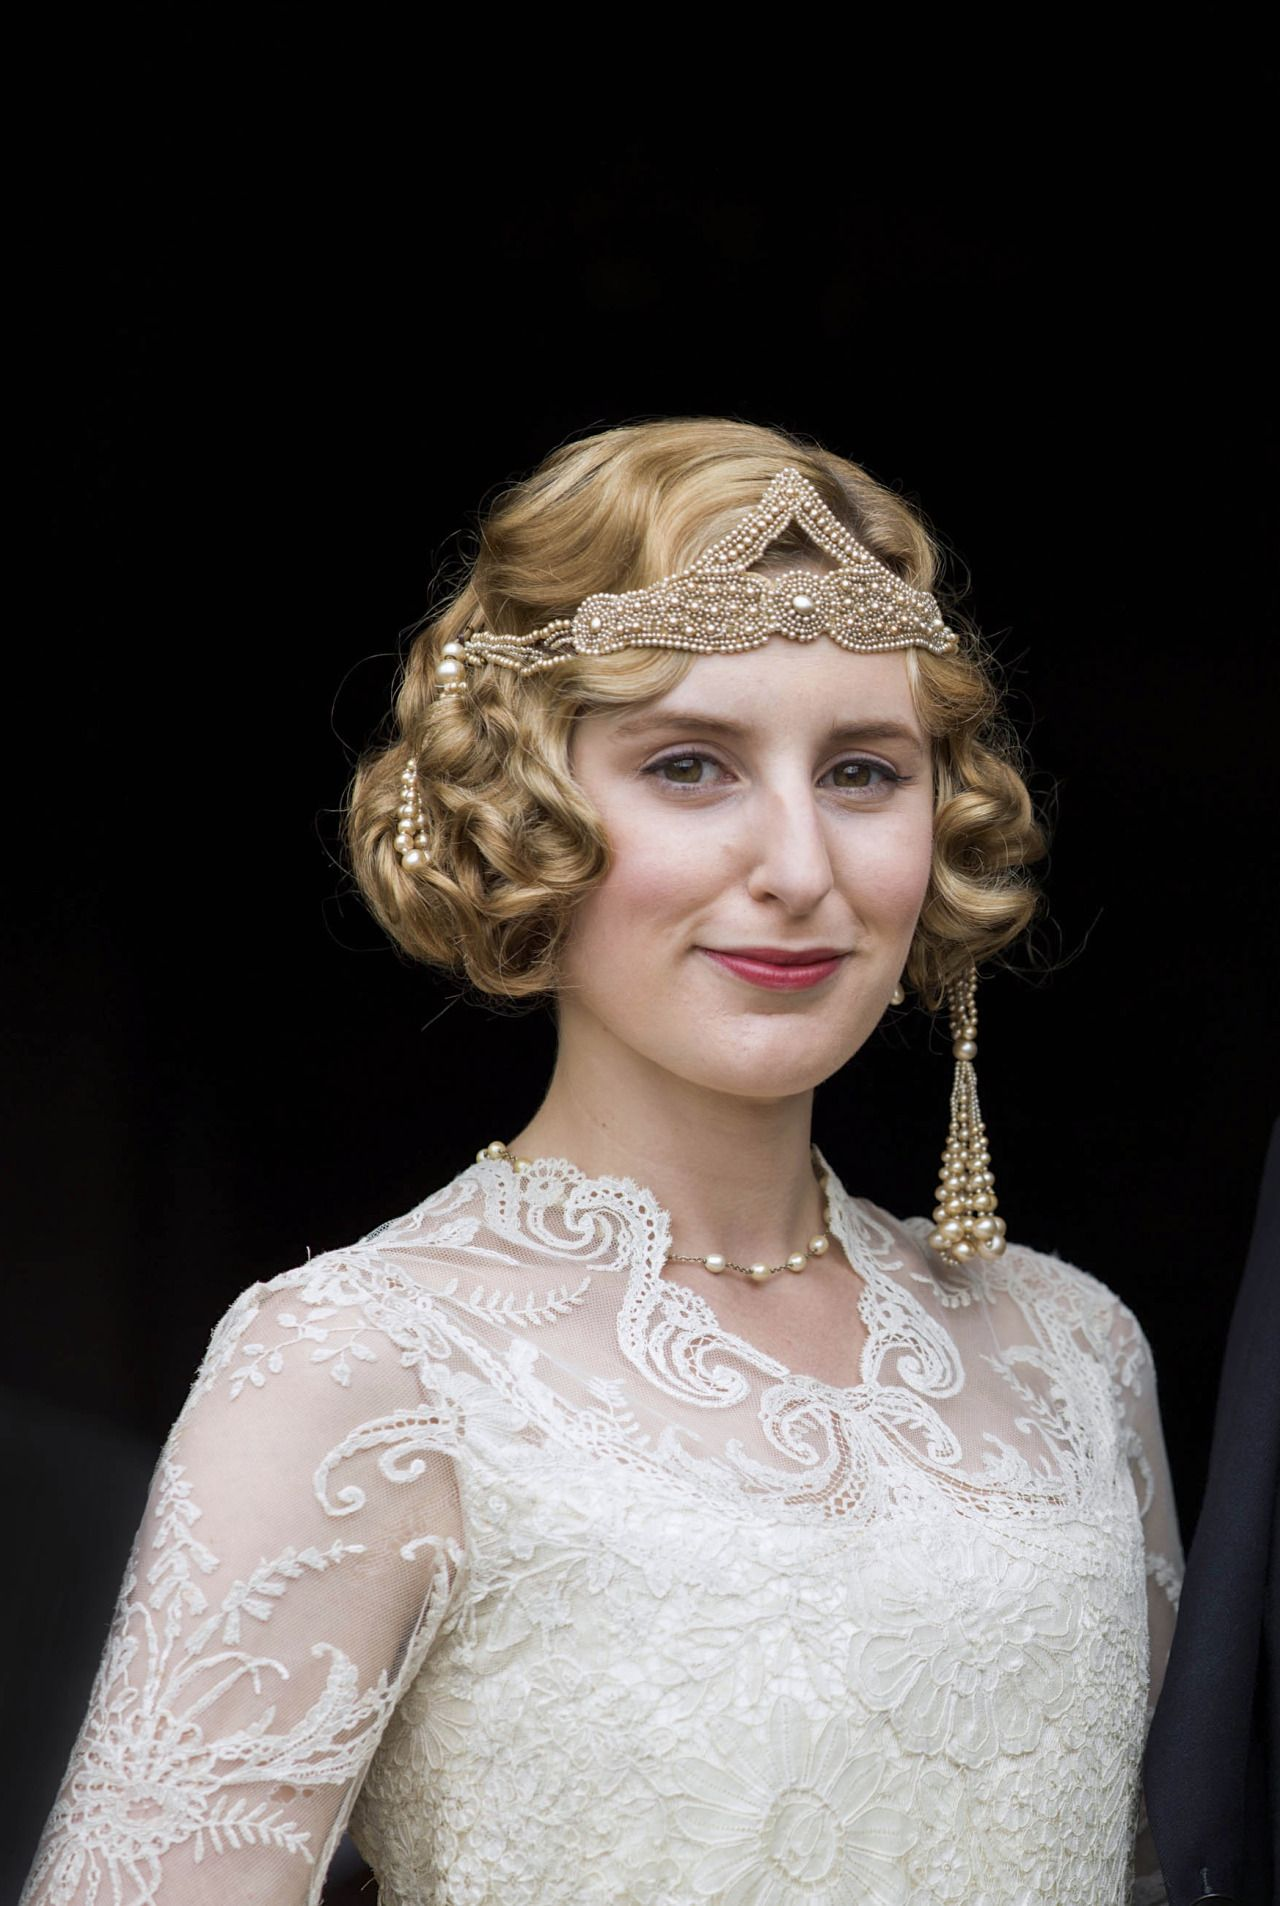 Downton Abbey Season 6 Episode 9 Christmas Special And Series Finale Laura Carmichael As Bride Edith Pelham Lady Hexham